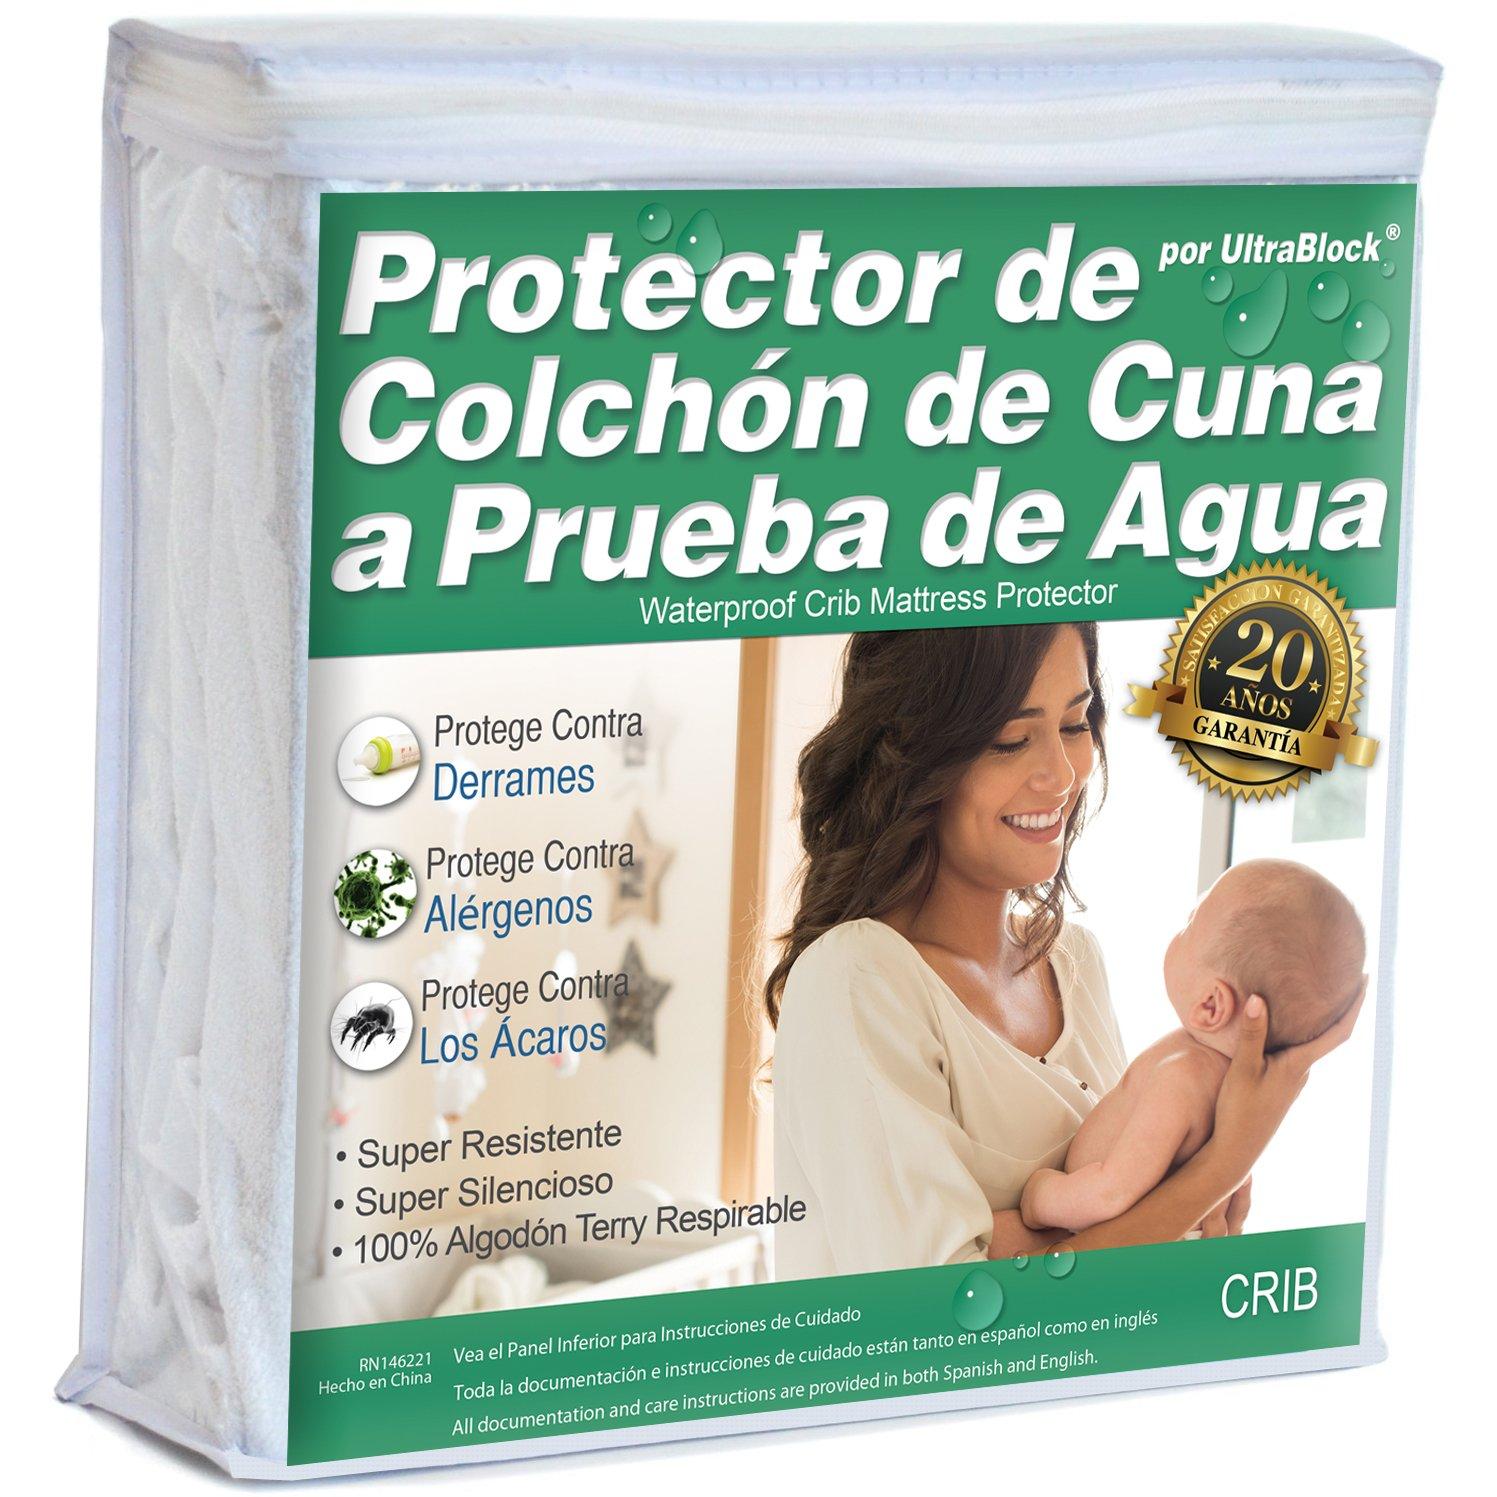 Amazon.com: UltraBlock Protector de colchón impermeable King - Funda de Terry de algodón Suave Premium: Home & Kitchen